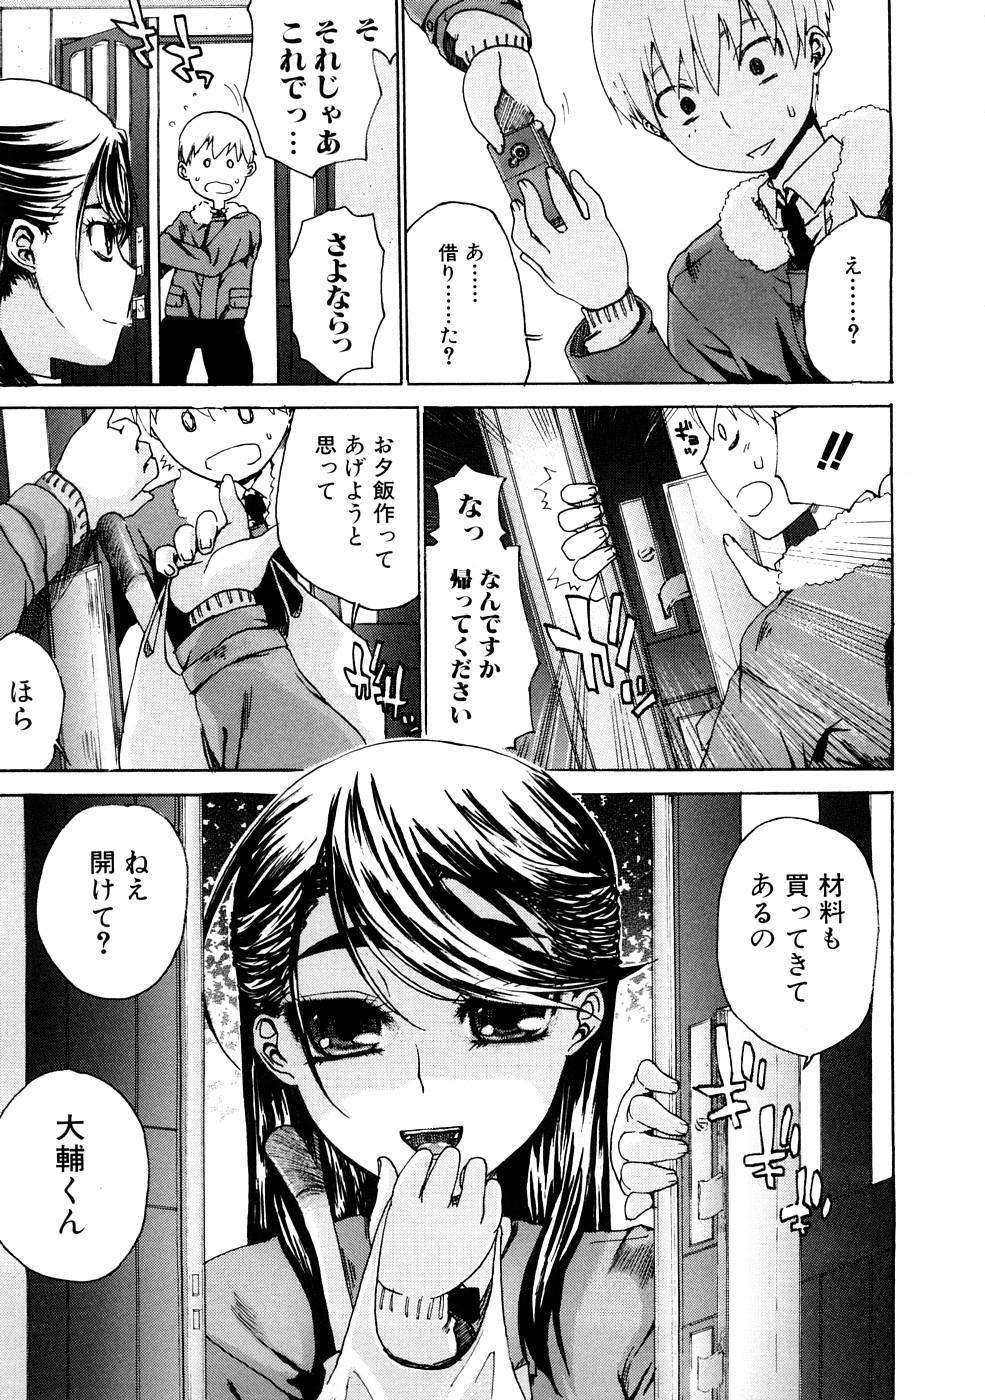 Ecchi de Jibunkatte de Kawaii Ko 118